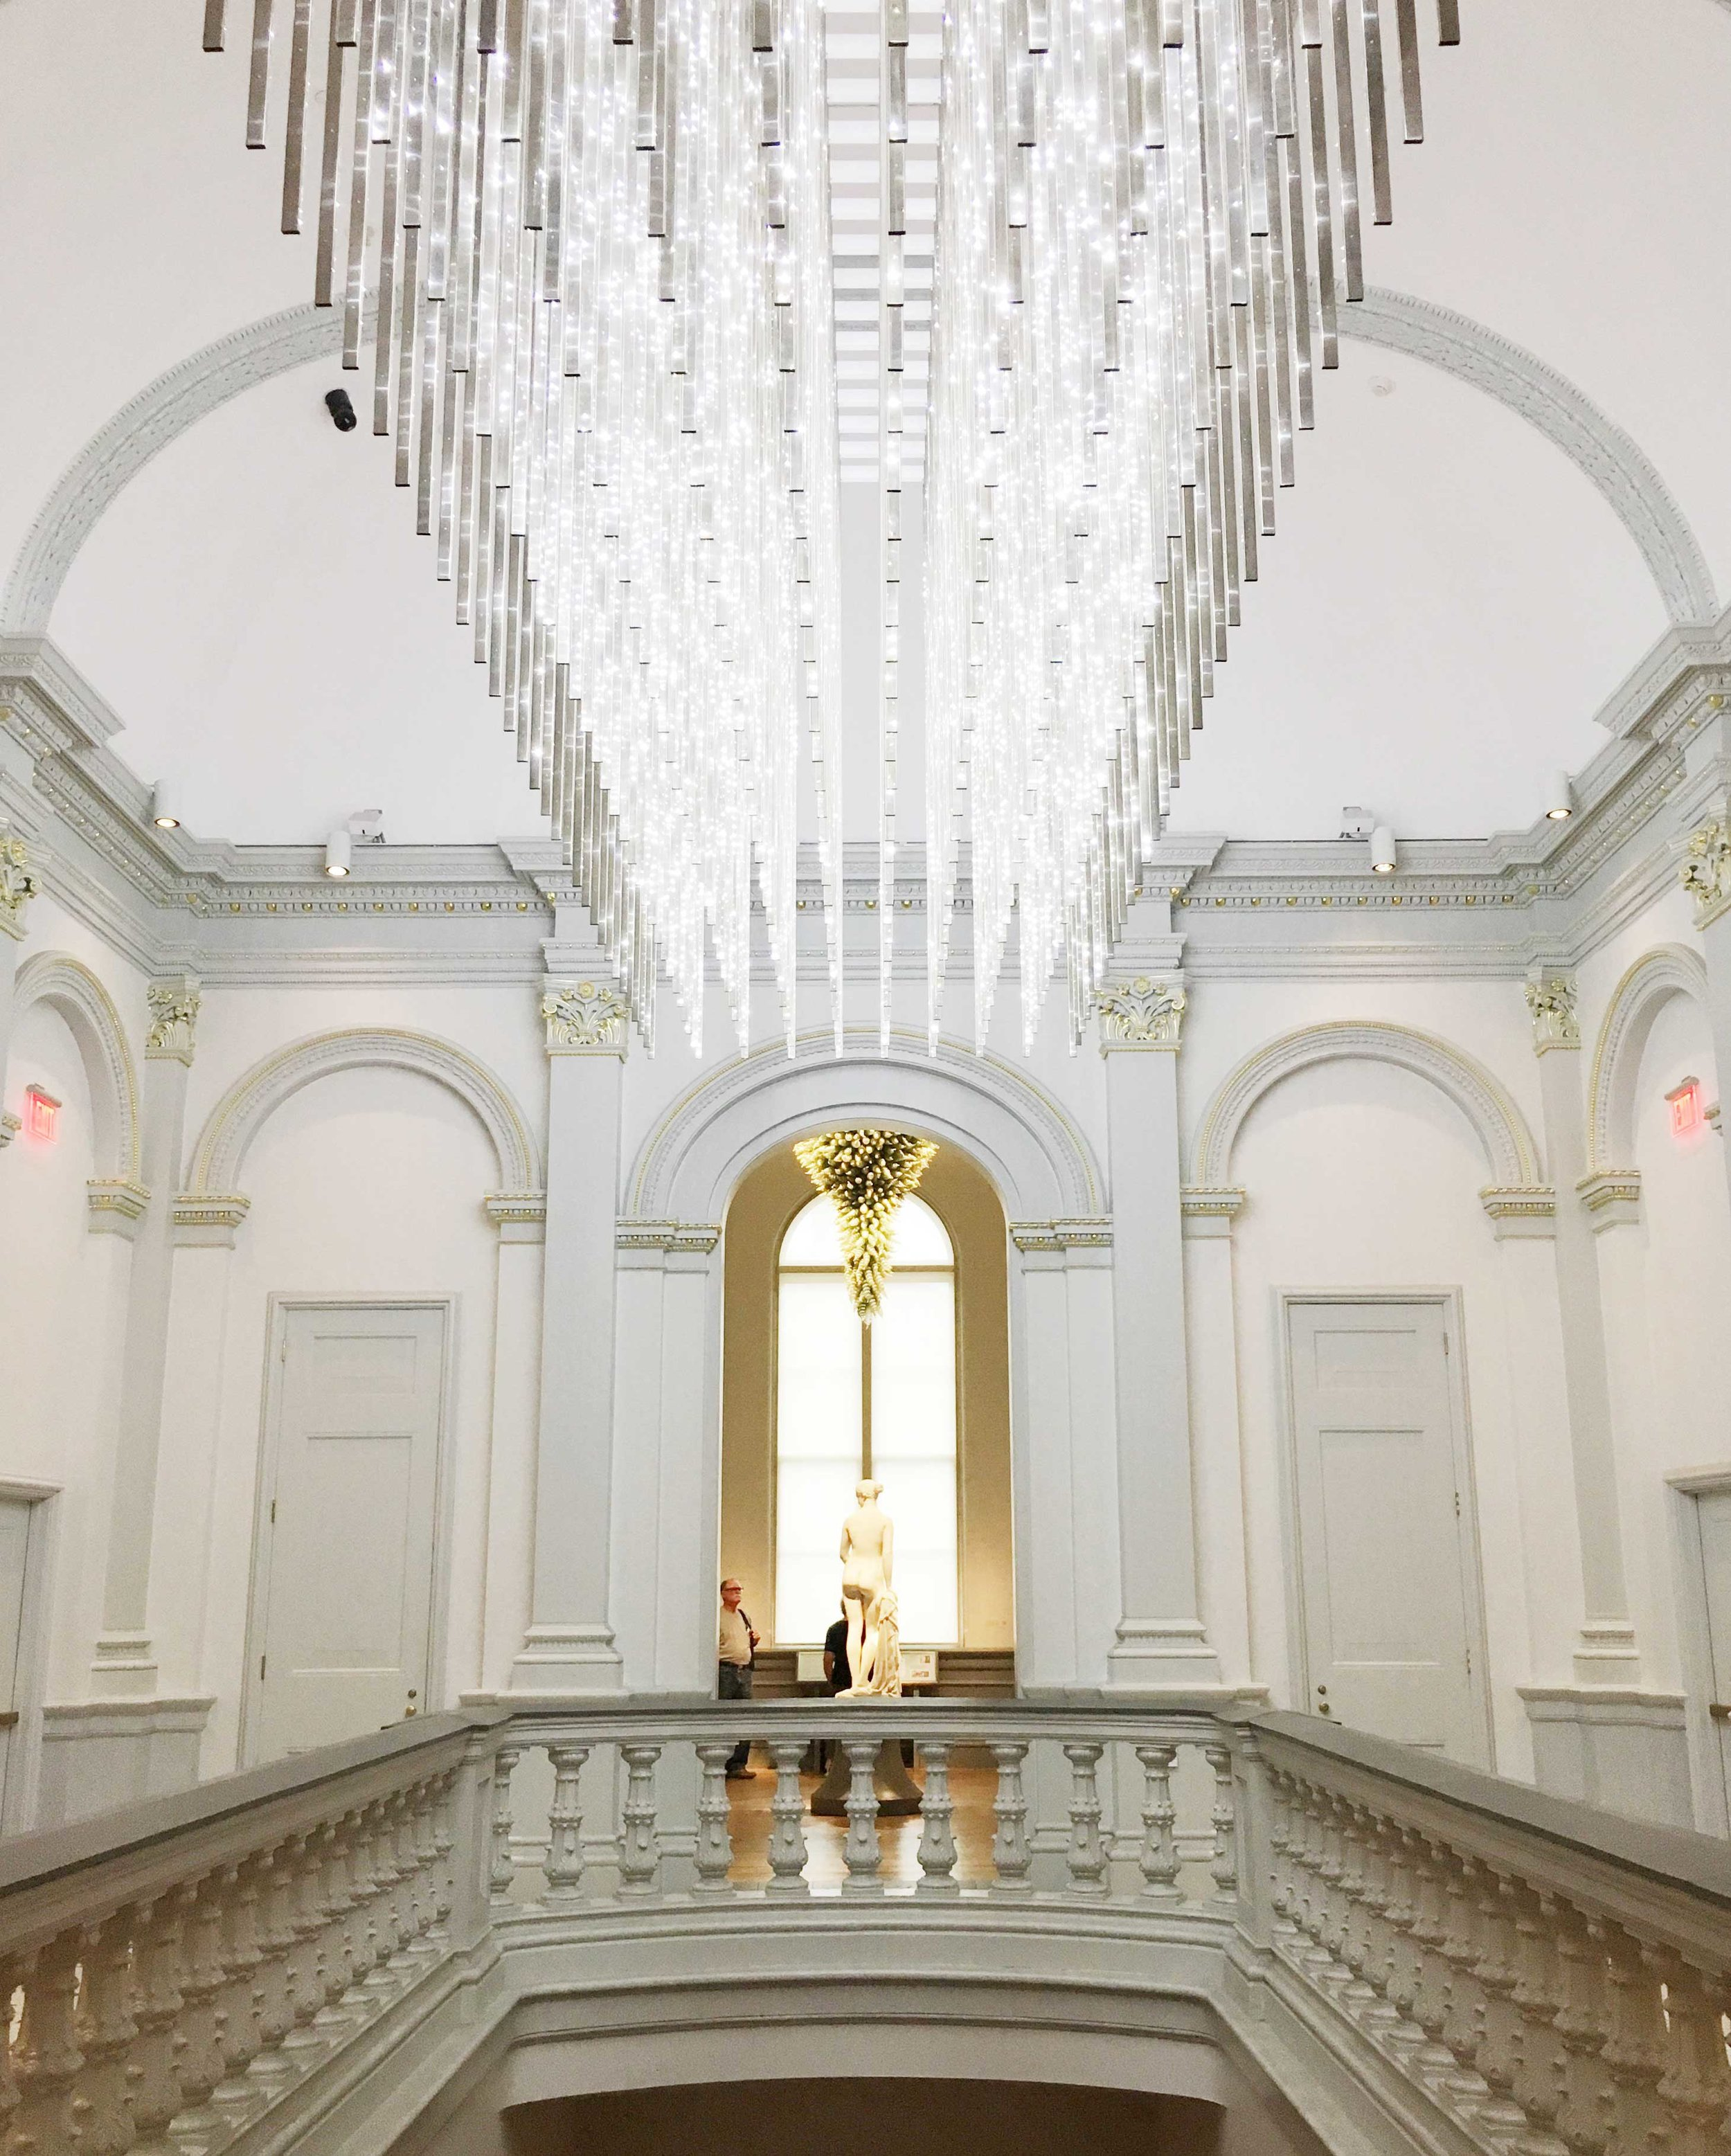 Smithsonian Renwick Gallery in Washington D.C.